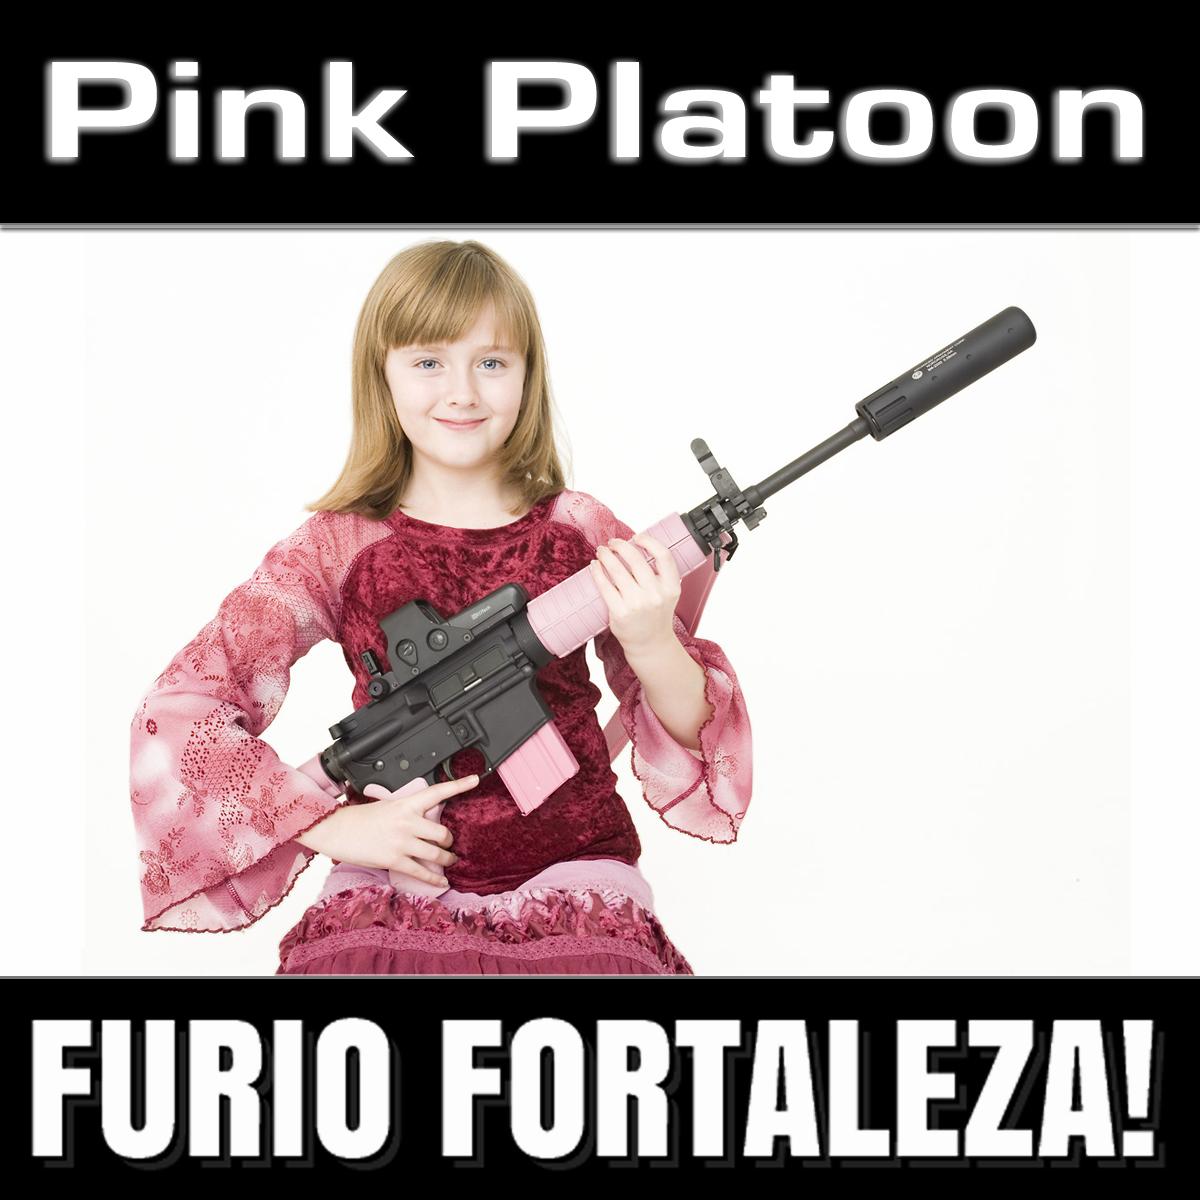 Furio Fortaleza! - 4.7 - Pink Platoon